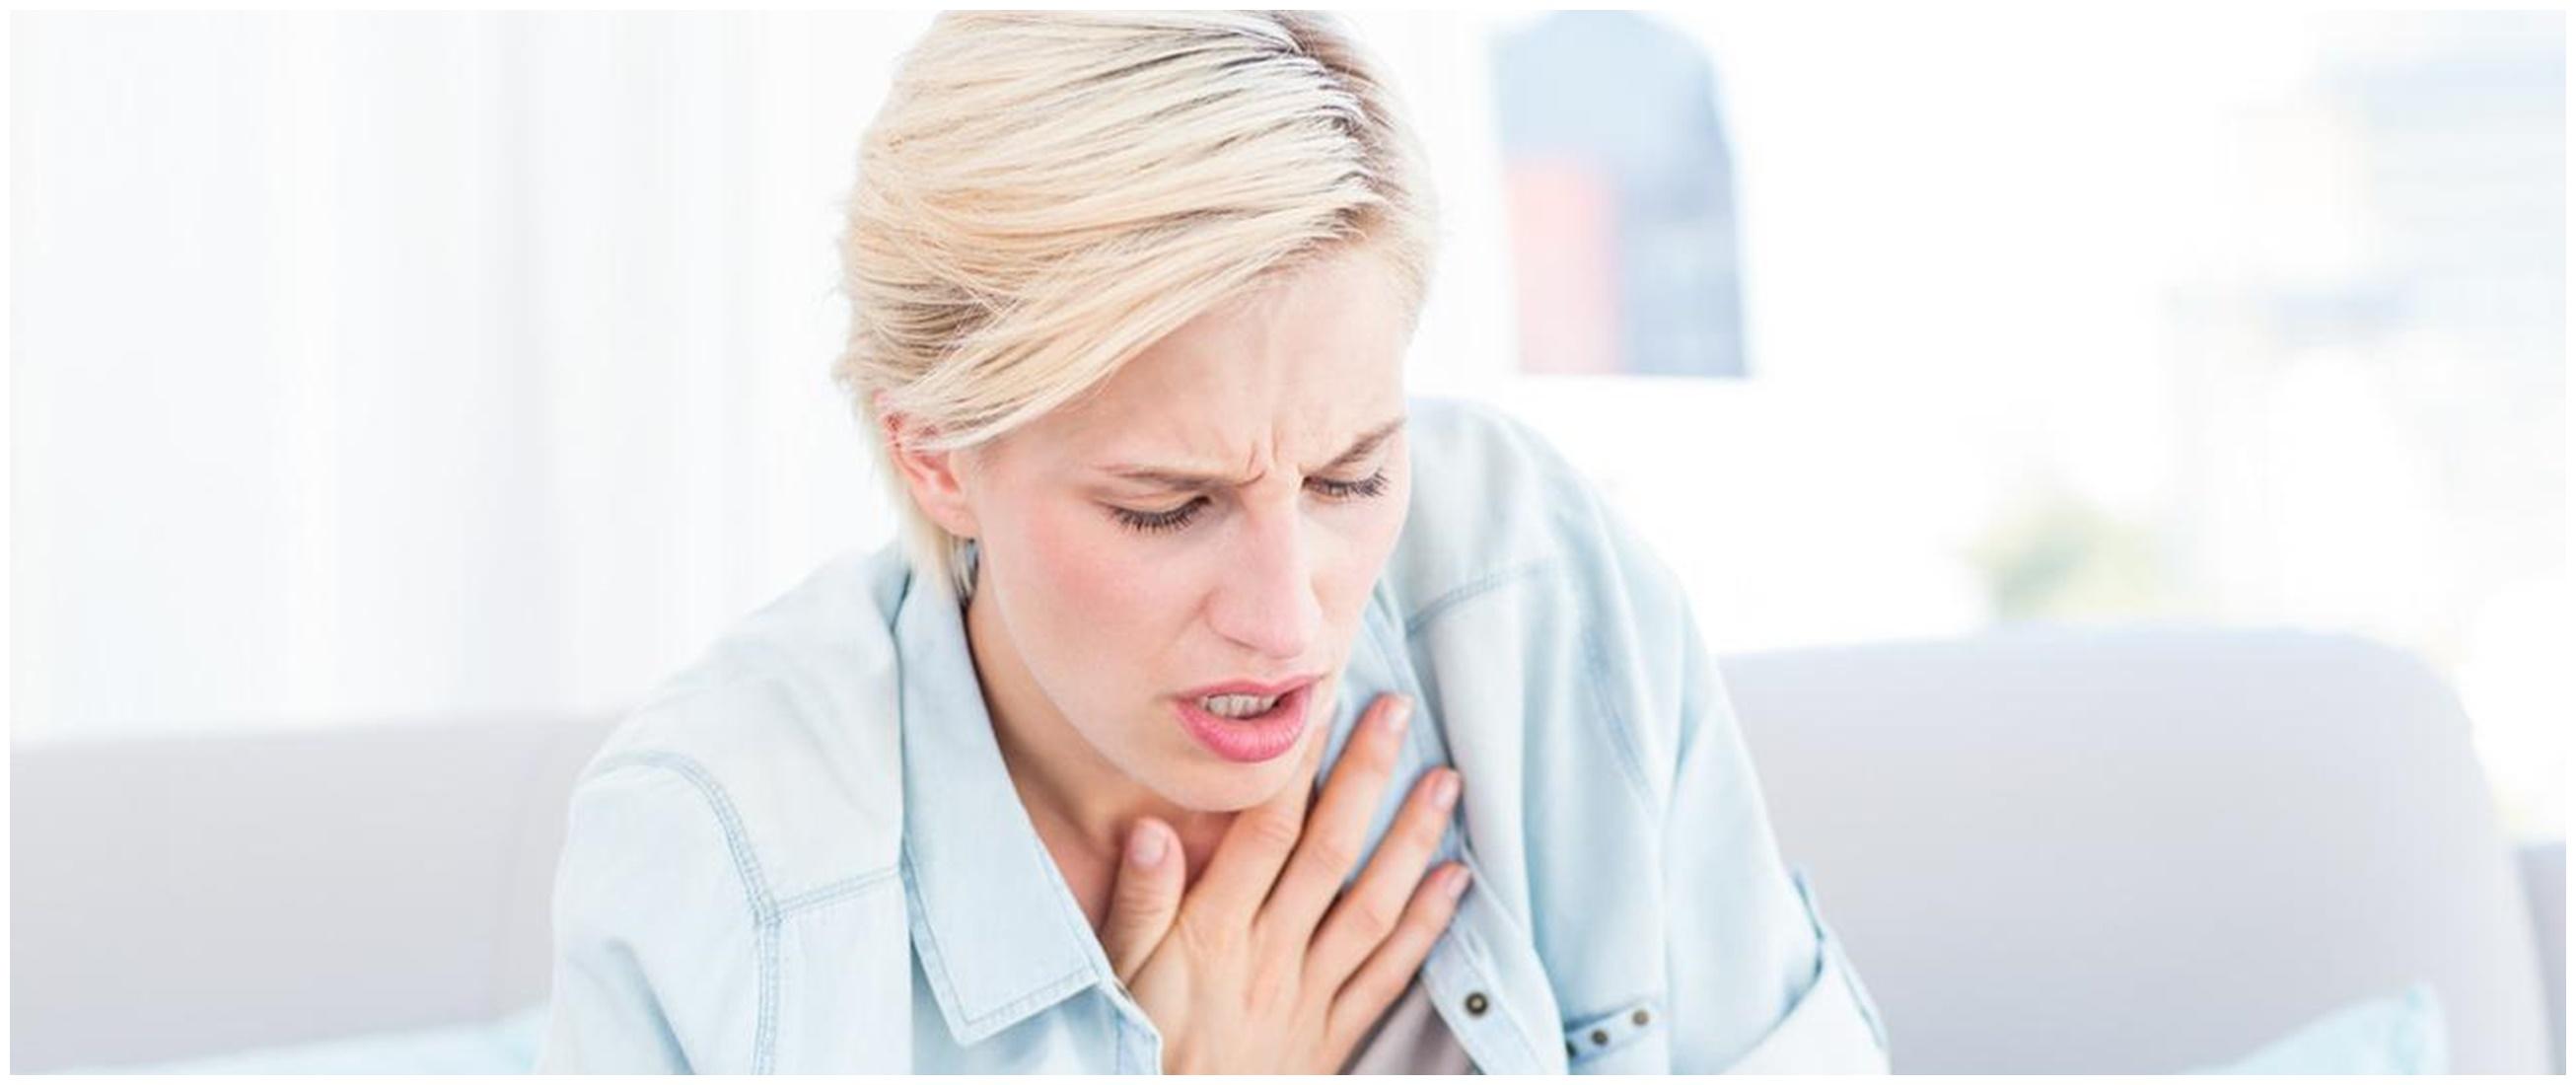 Ciri-ciri terinfeksi Corona dan langkah pertama jika rasakan gejala